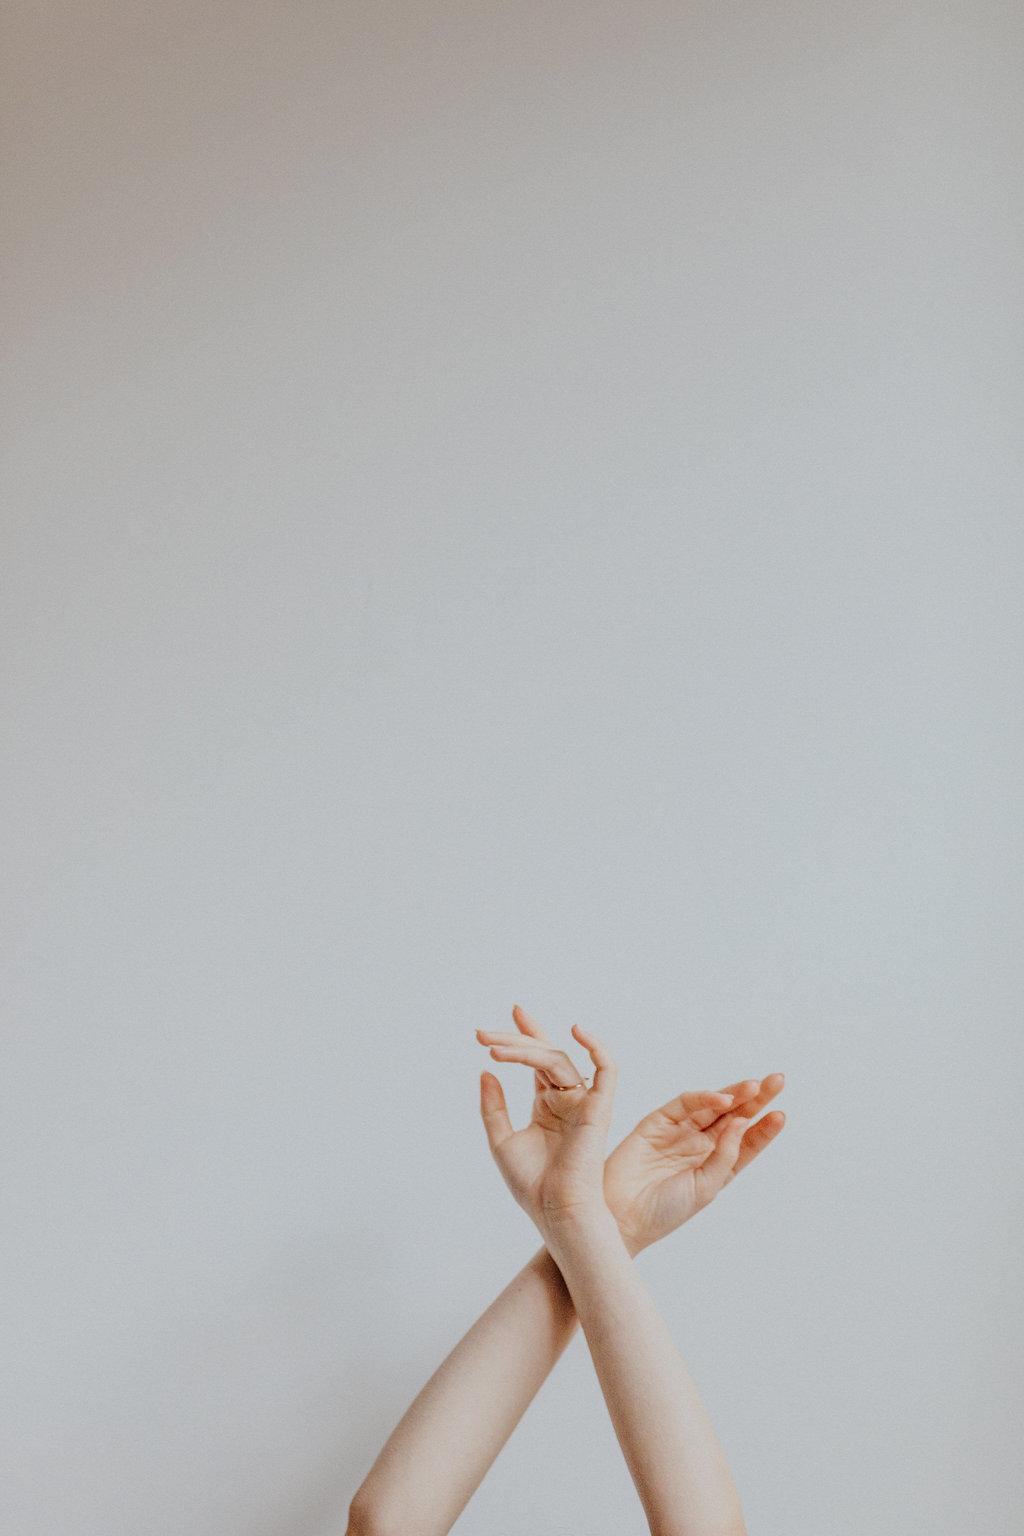 Blush-and-Bowties-Minimalist-Artisinal-Christine-Lim-028.JPG